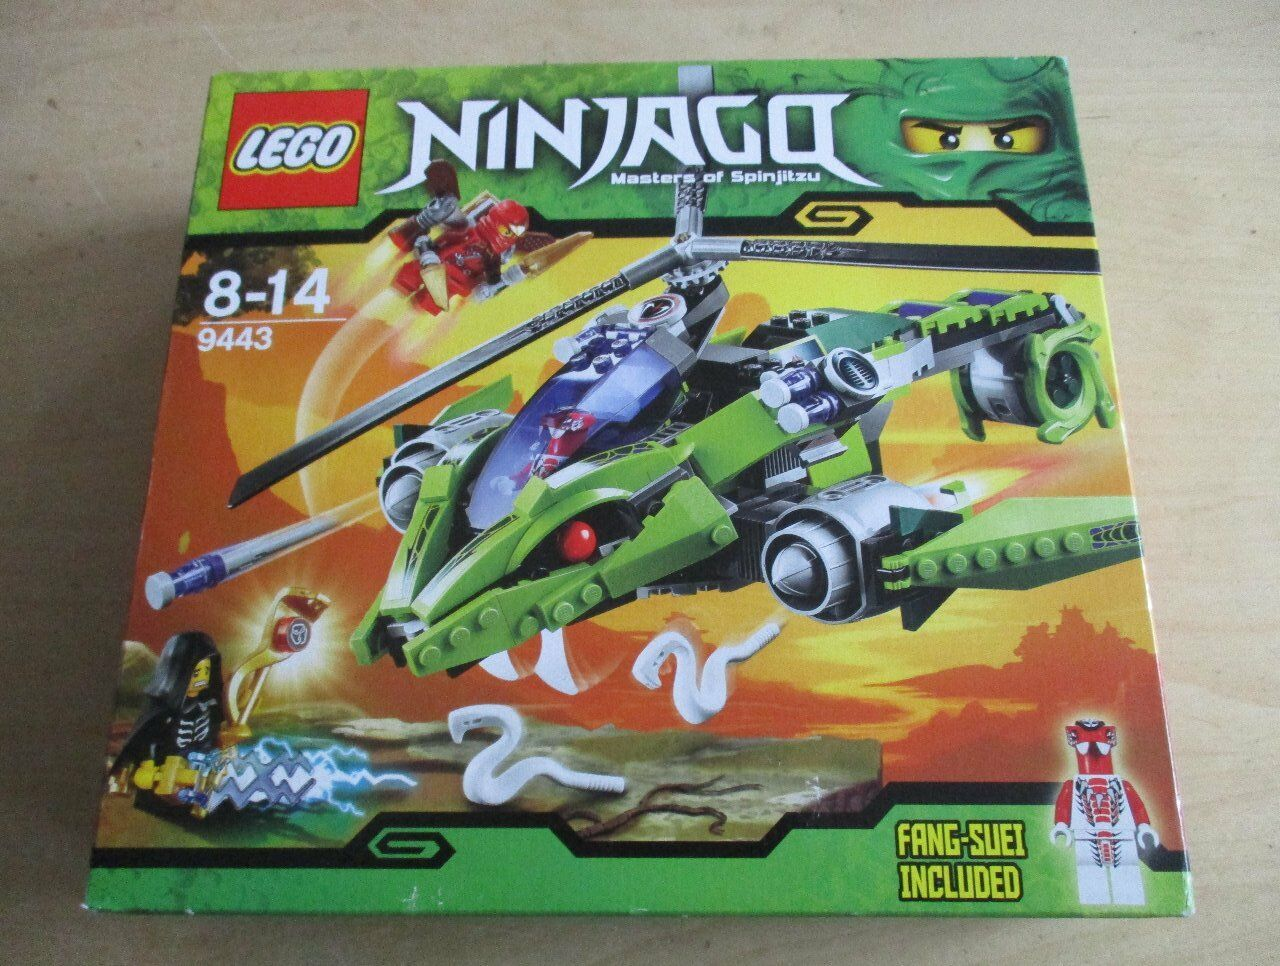 Lego 9443 NINJAGO RATTLECOPTER RATTLECOPTER RATTLECOPTER  BA  neuf dans sa boîte 65628f